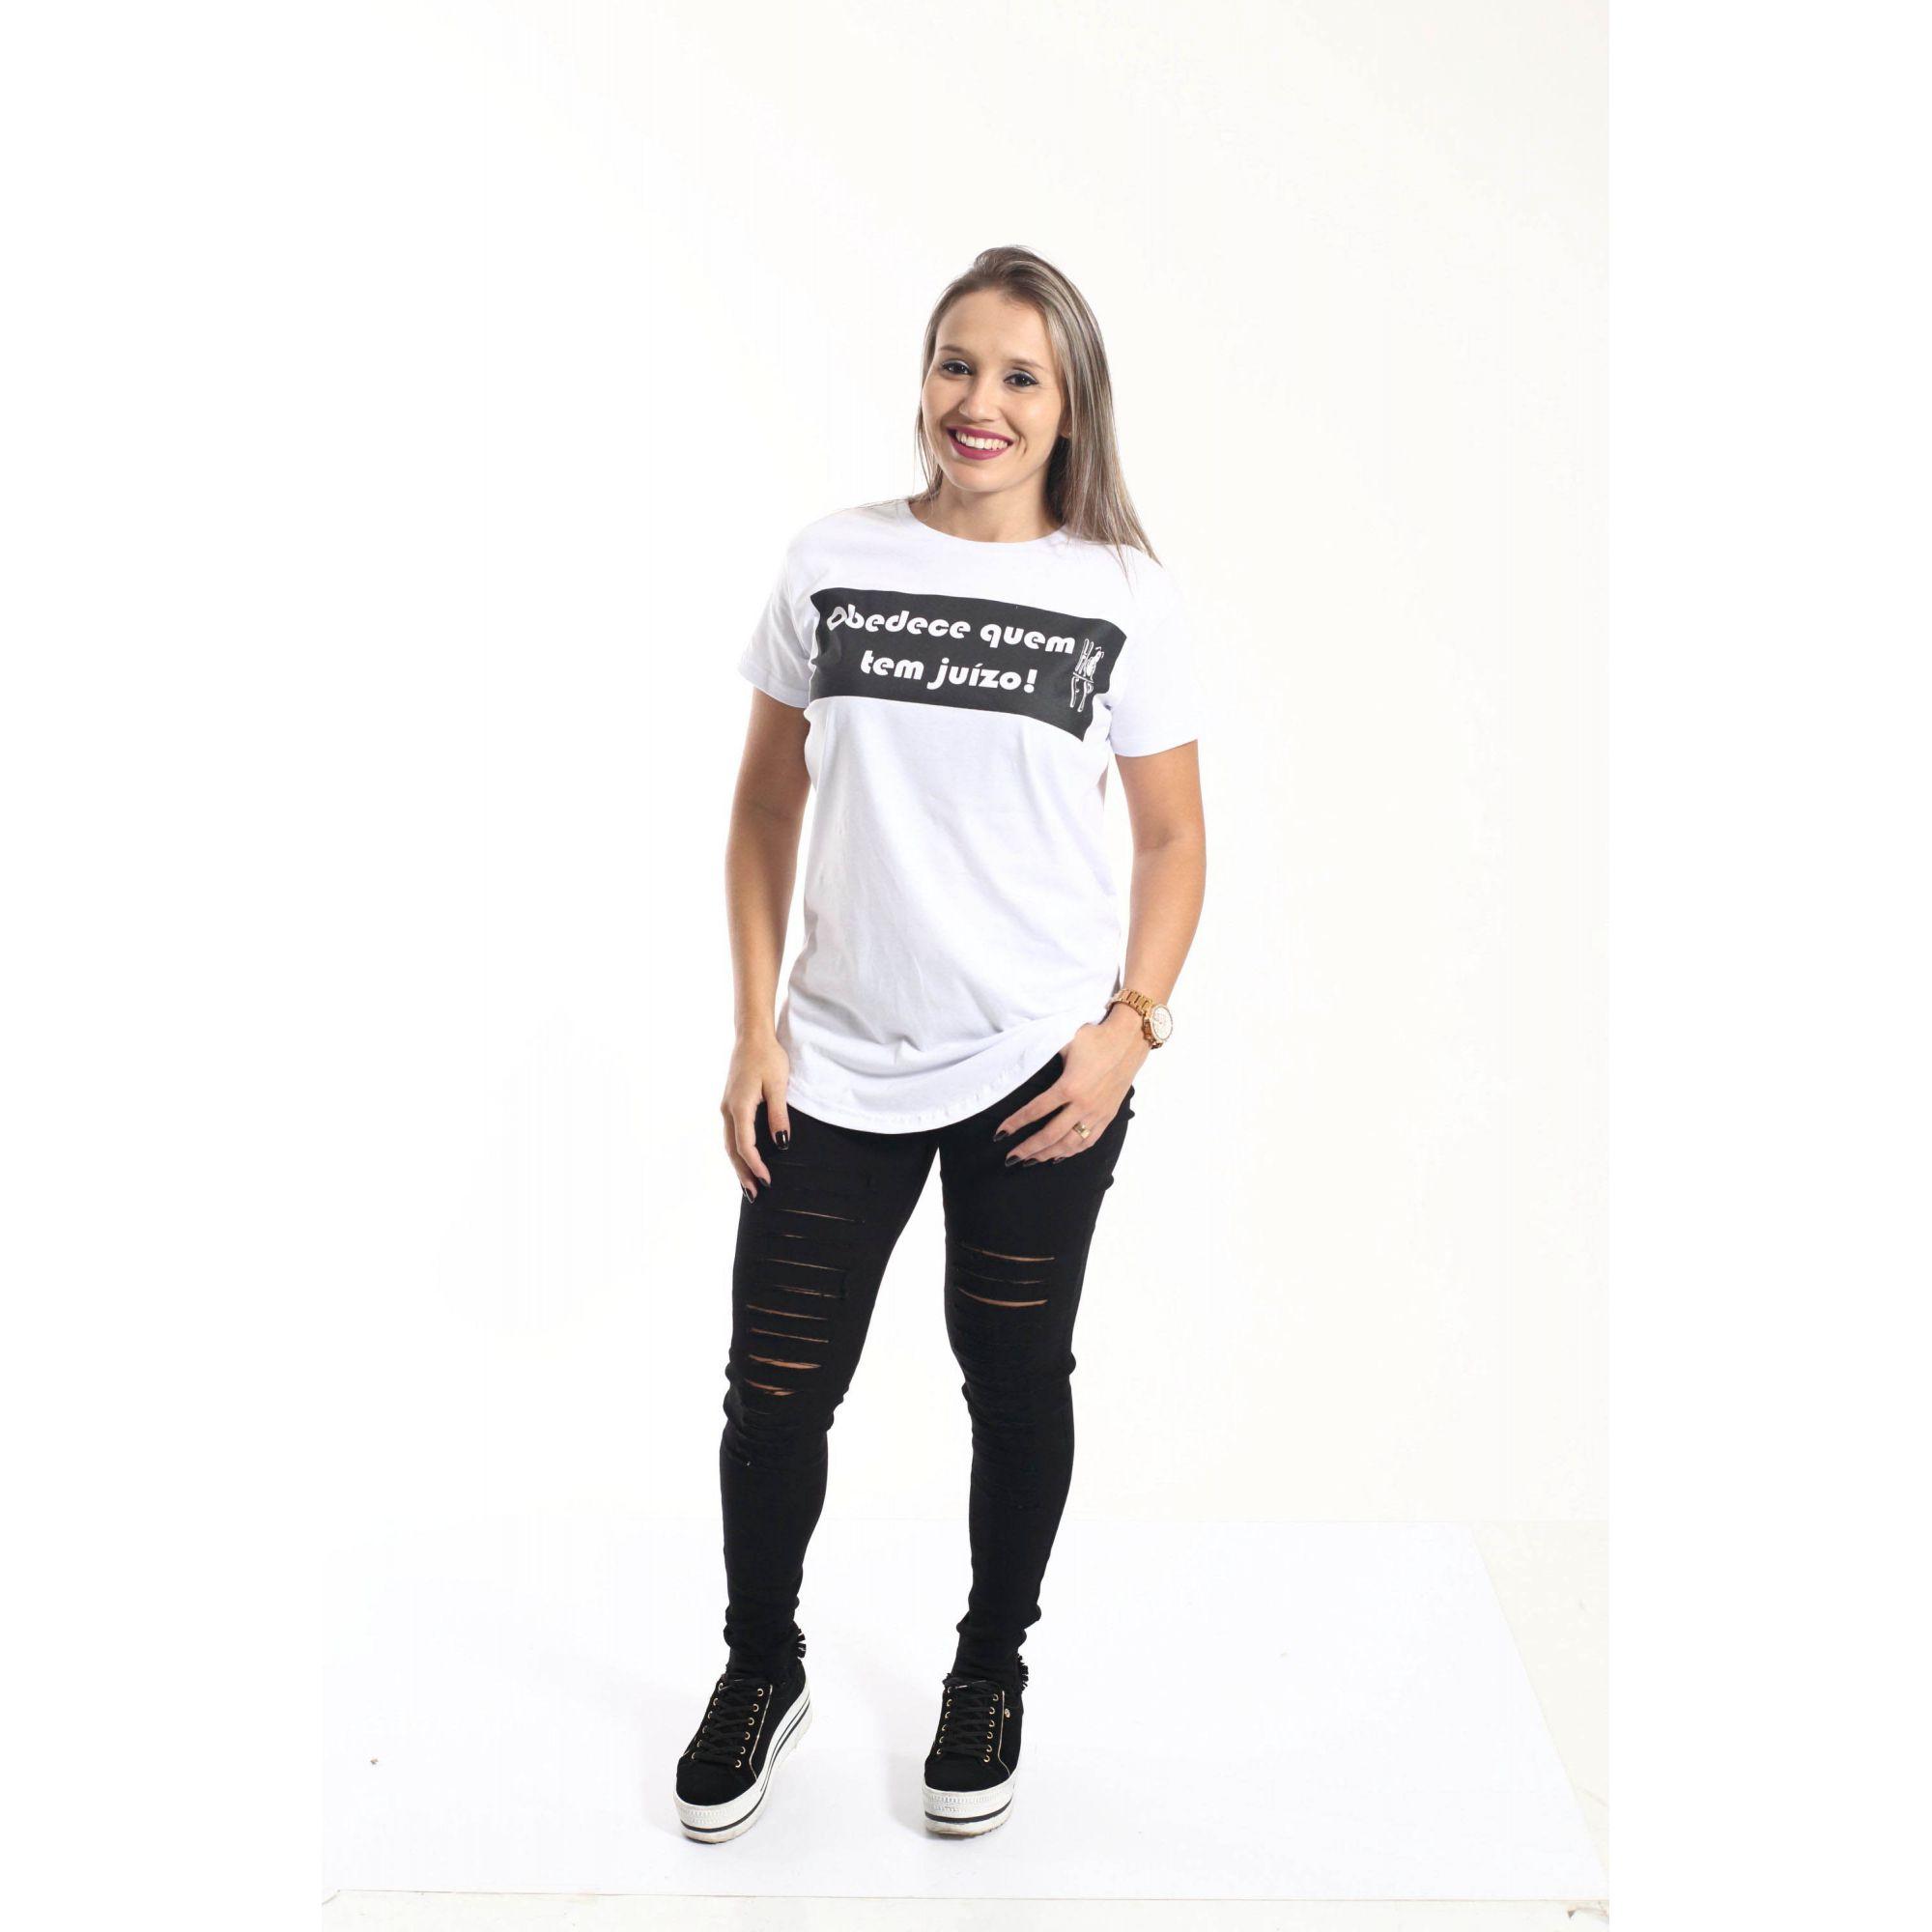 Camiseta Long Unissex Obedece Quem Tem Juízo  - Heitor Fashion Brazil